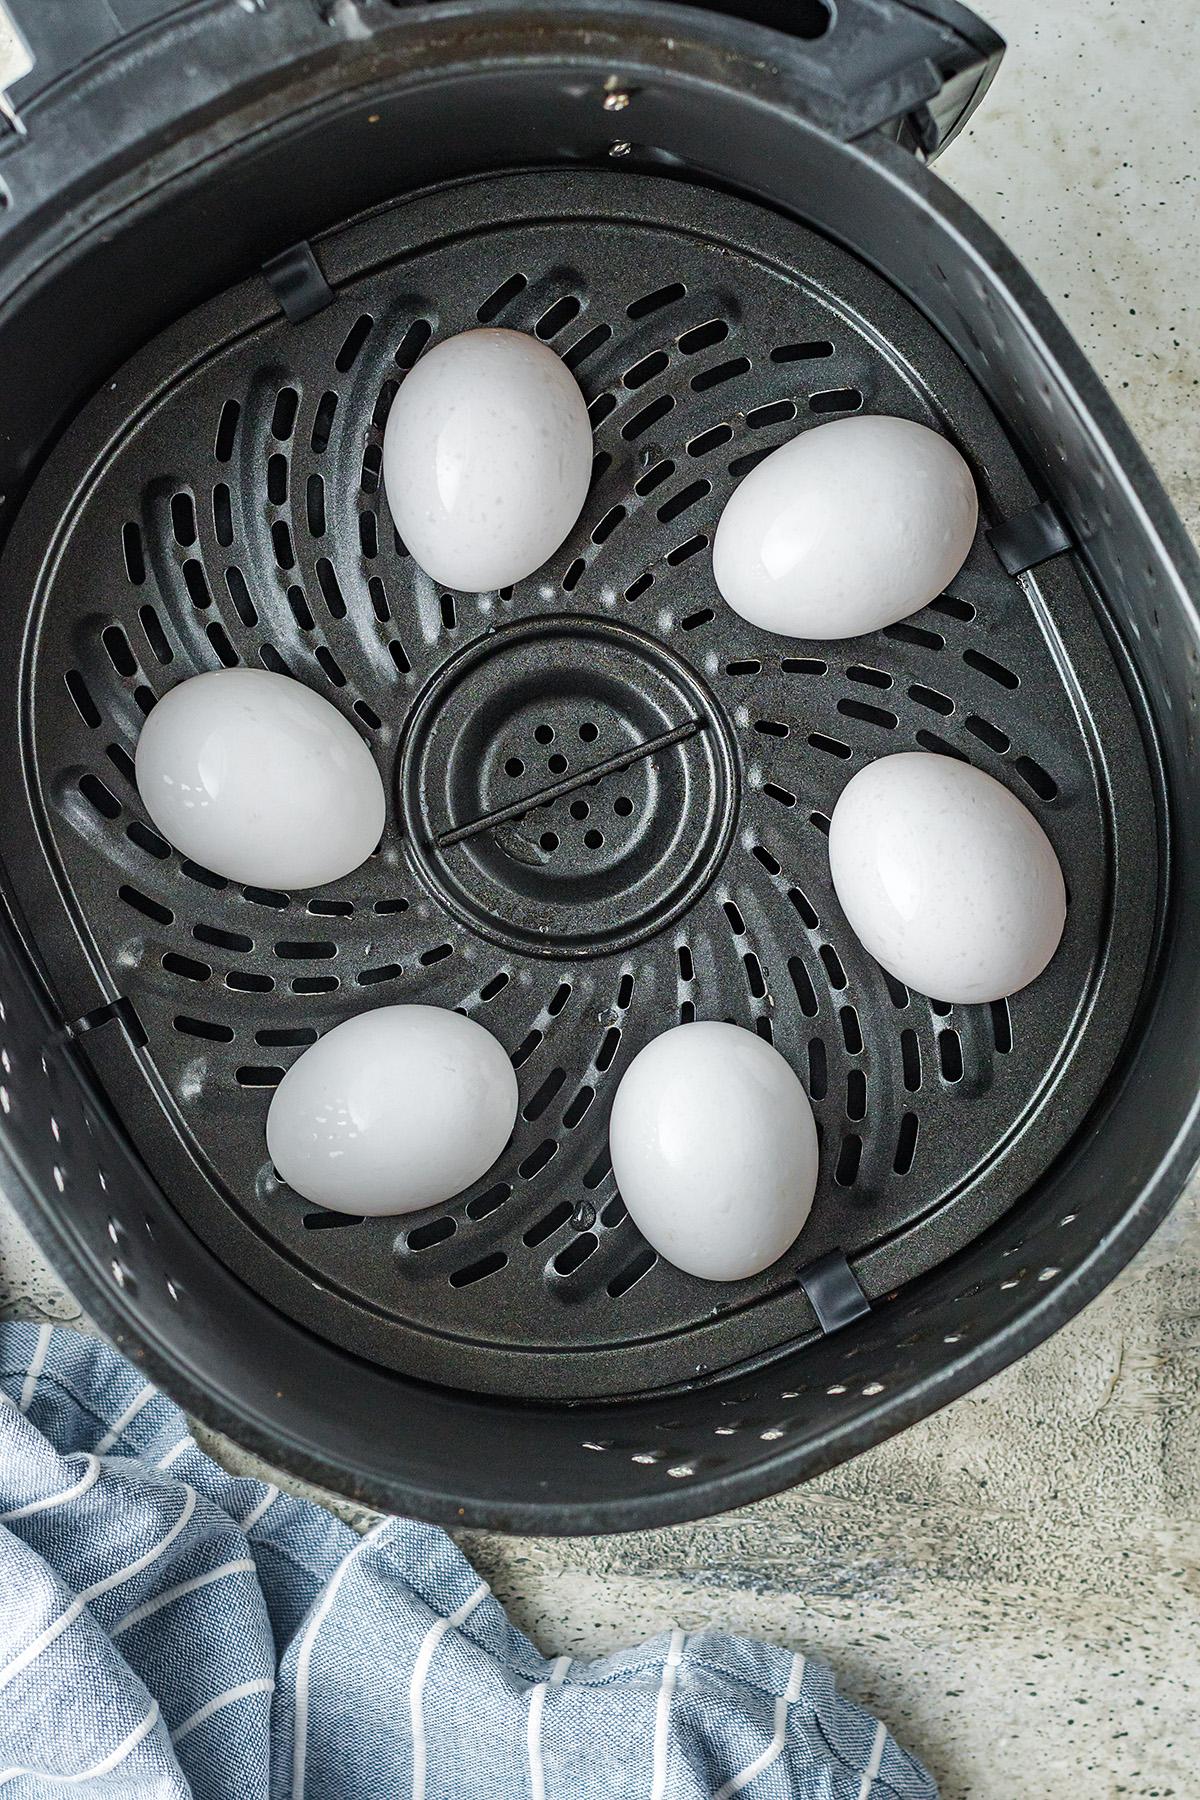 six eggs in an air fryer basket